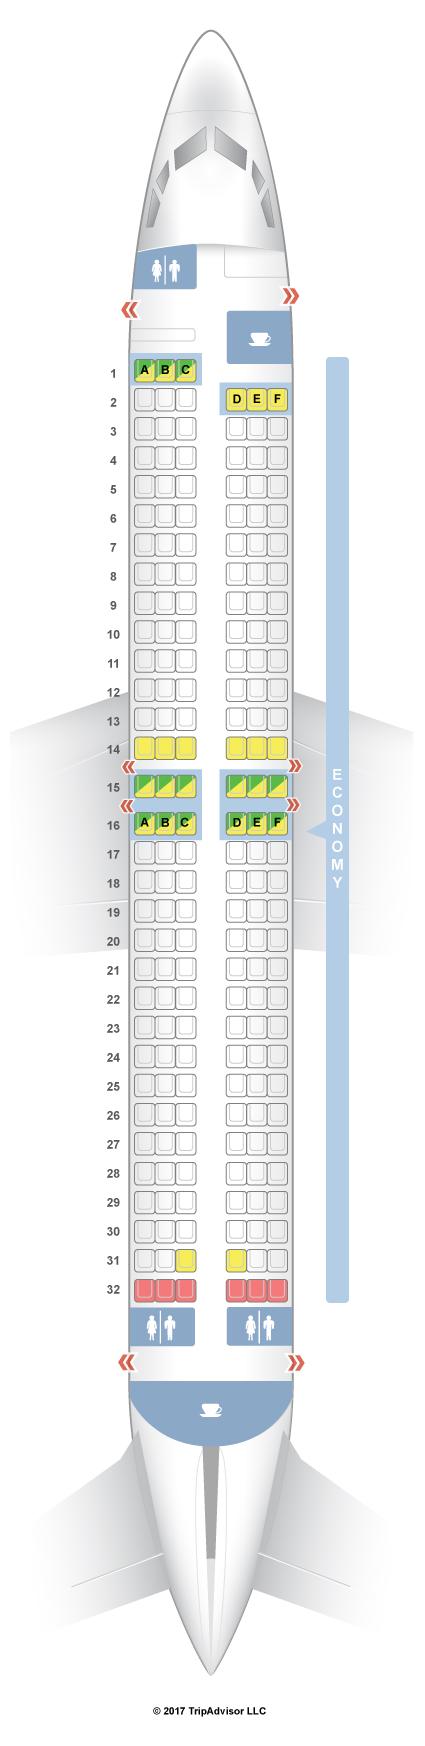 Seatguru Seat Map Transavia Airlines Boeing 737 800 738